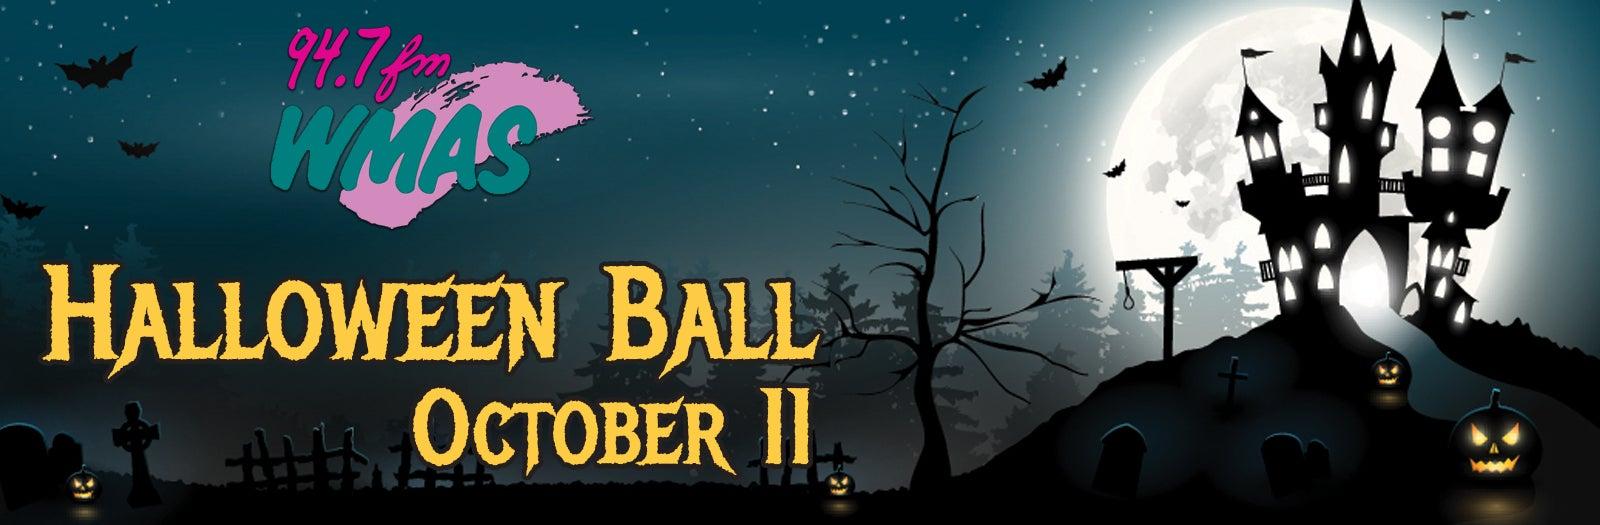 94.7 WMAS Halloween Ball